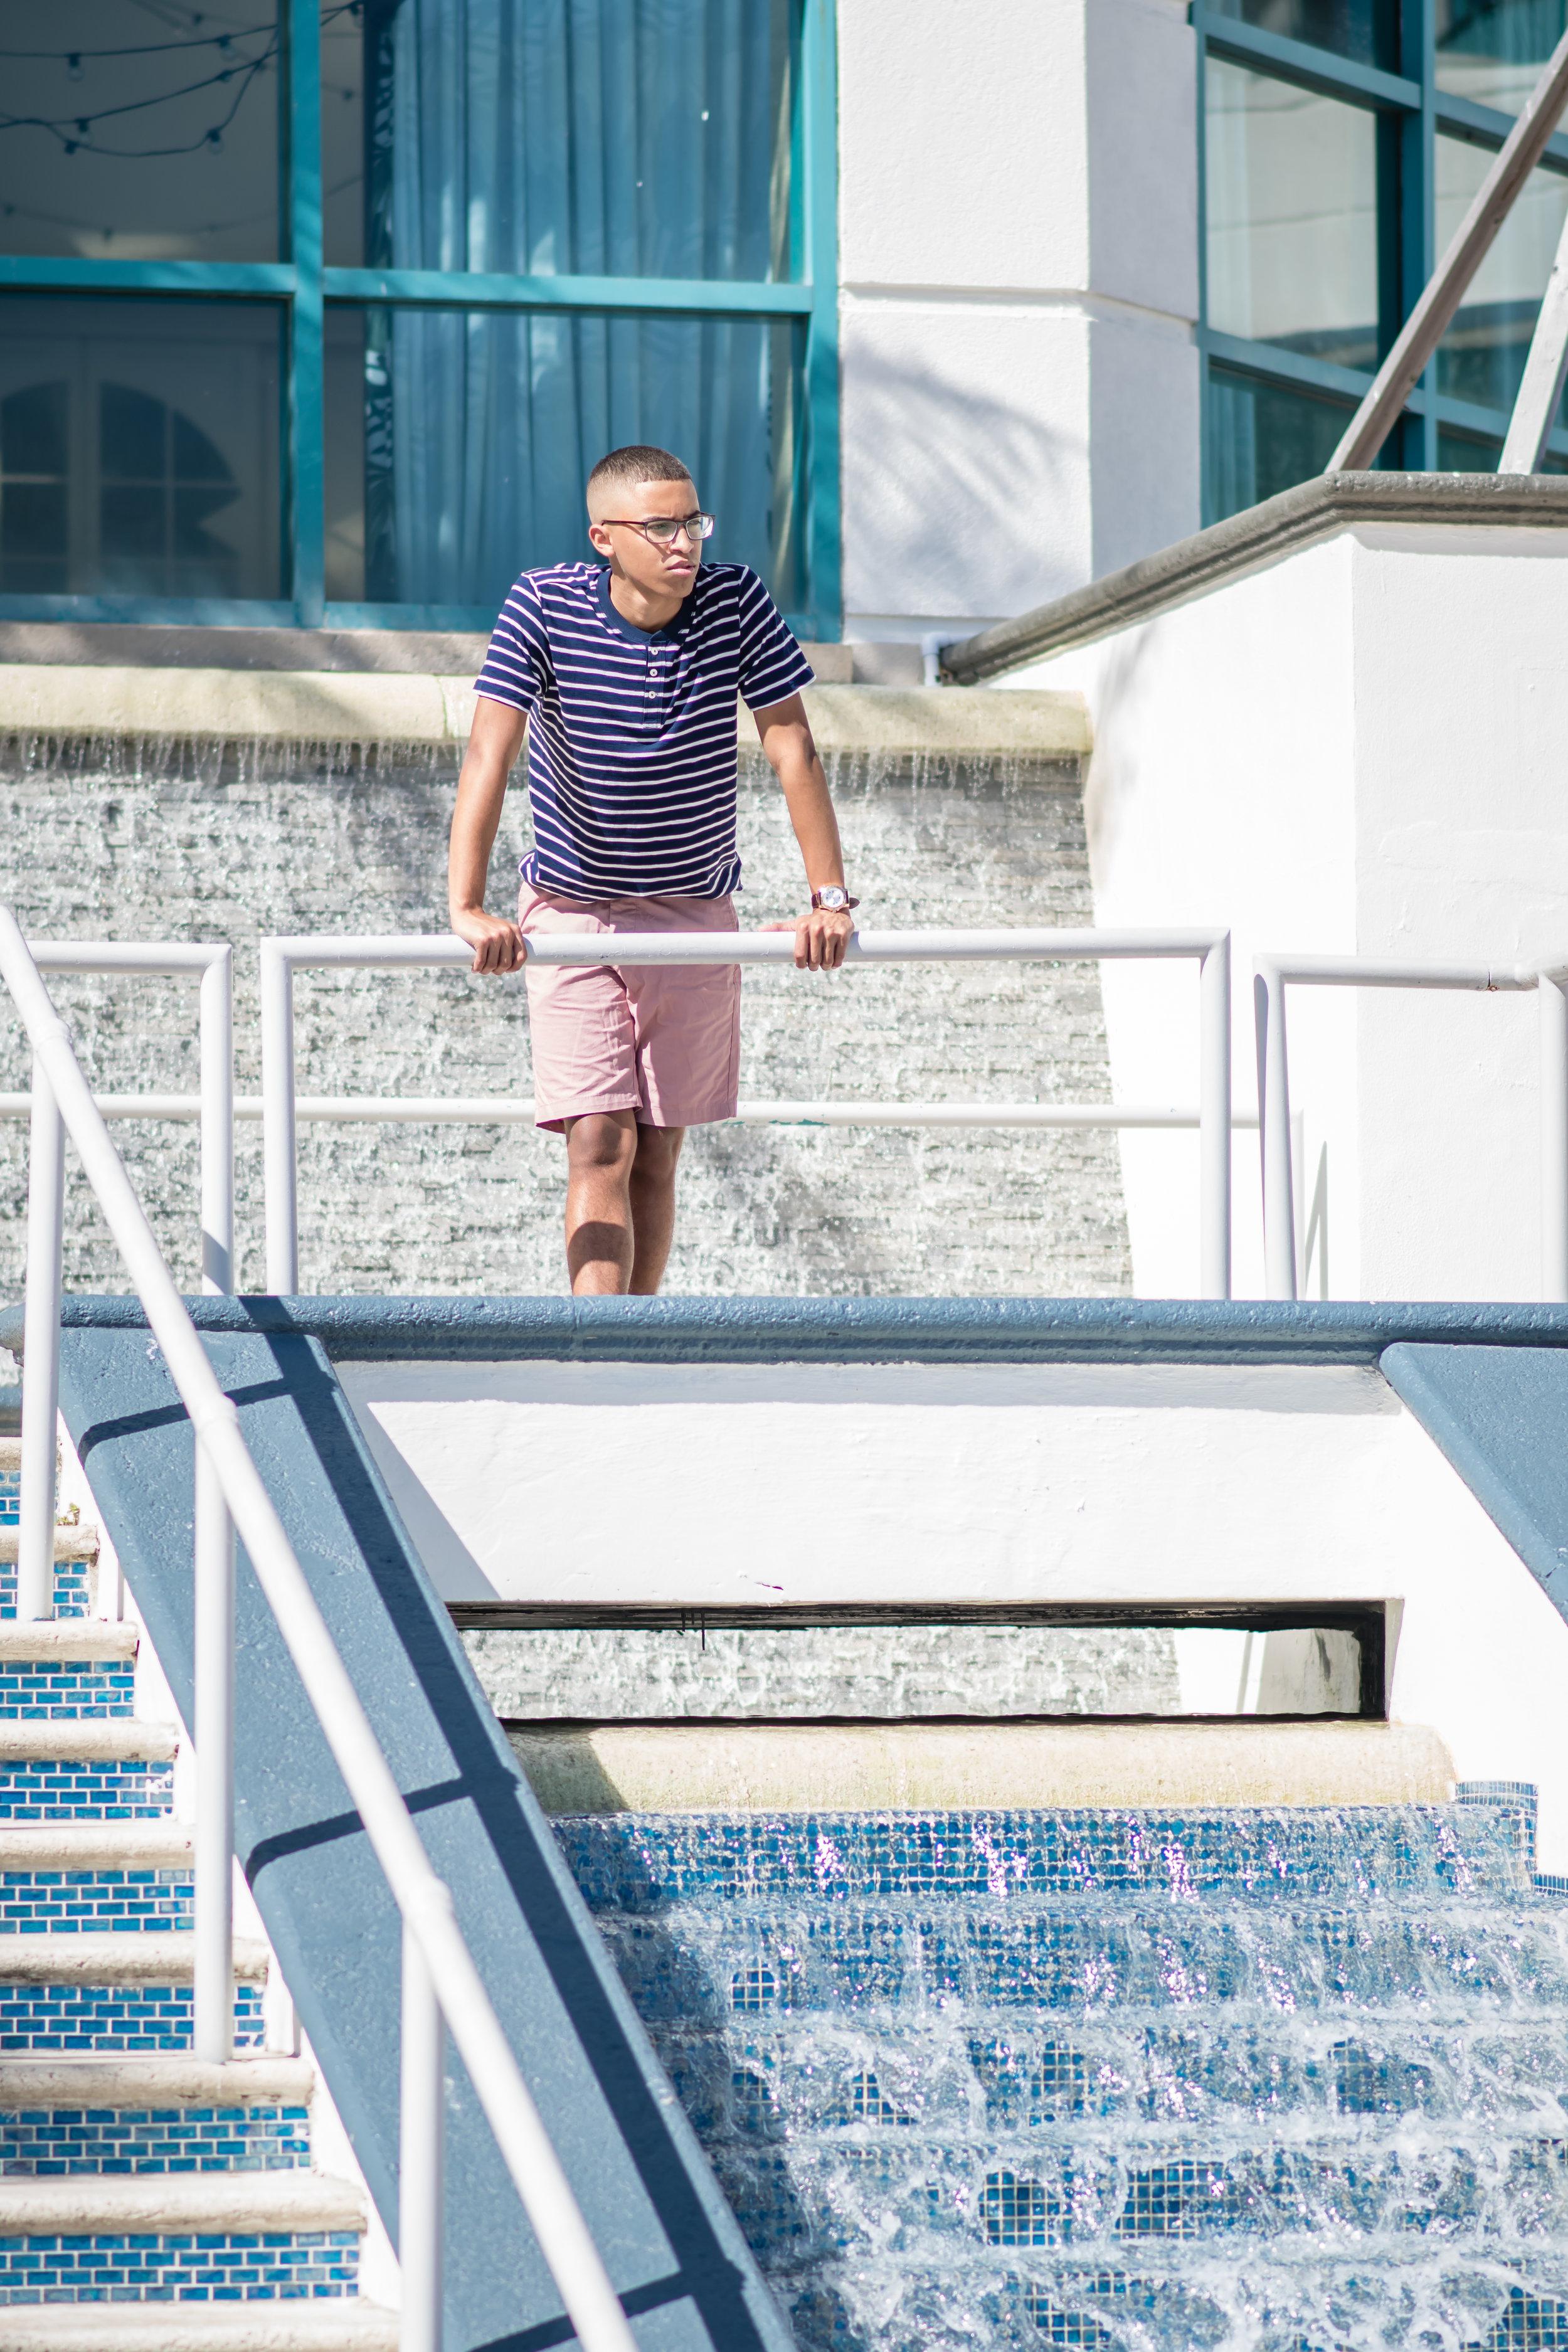 daytona-beach-men-fashion-photos-orlando-photographer-yanitza-ninett-10.jpg